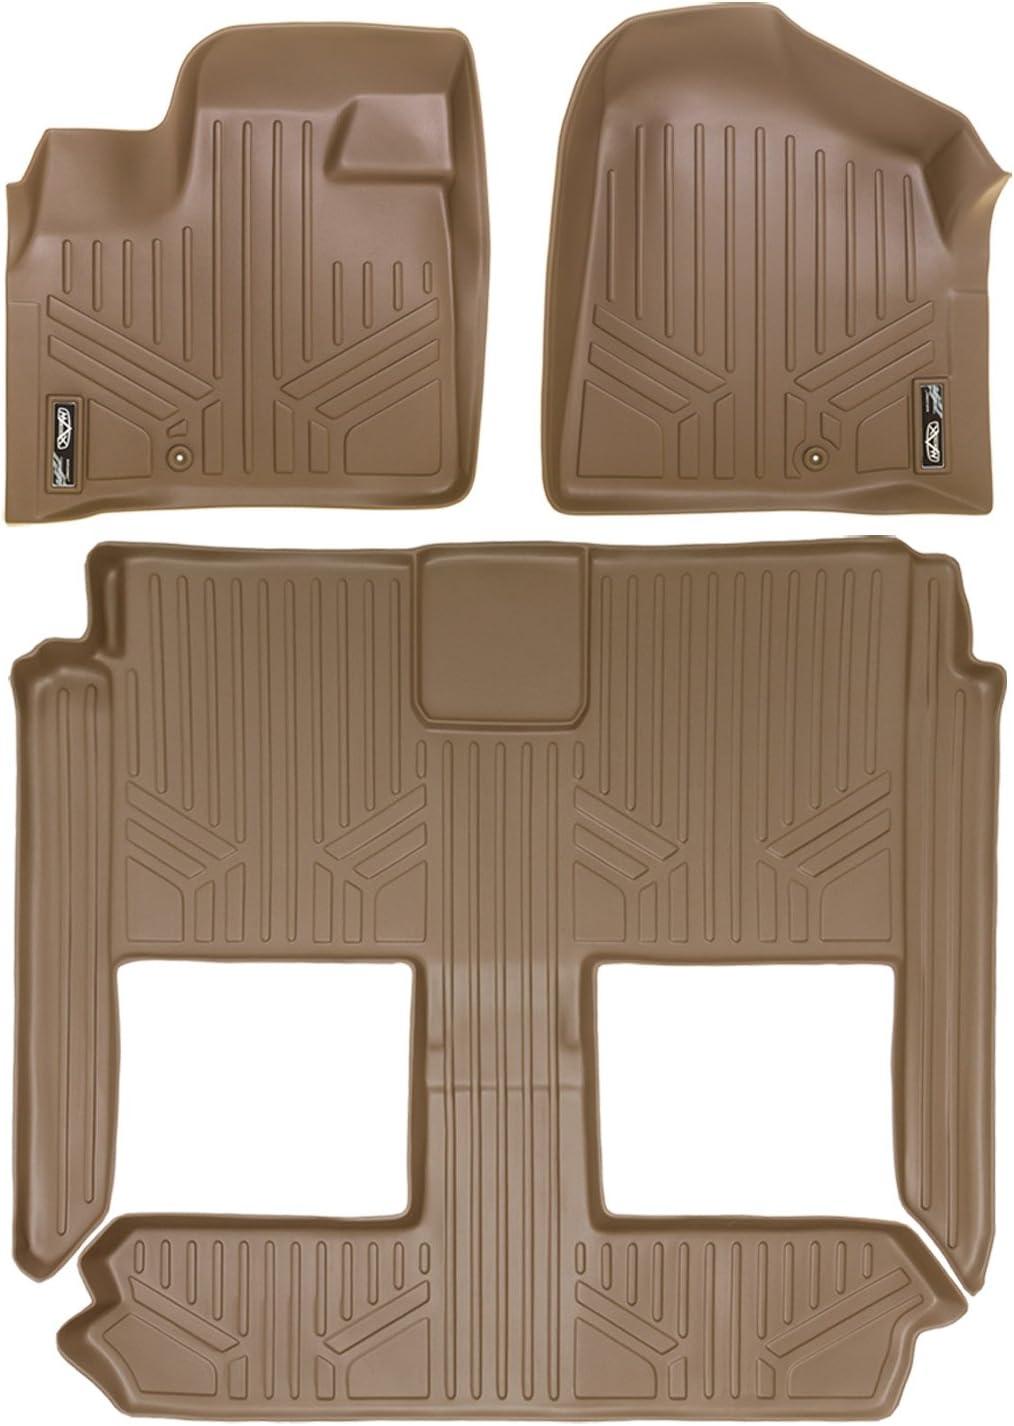 SMARTLINER Floor Mats 1st Row Liner Set Black for 2008-2018 Dodge Grand Caravan Chrysler Town /& Country